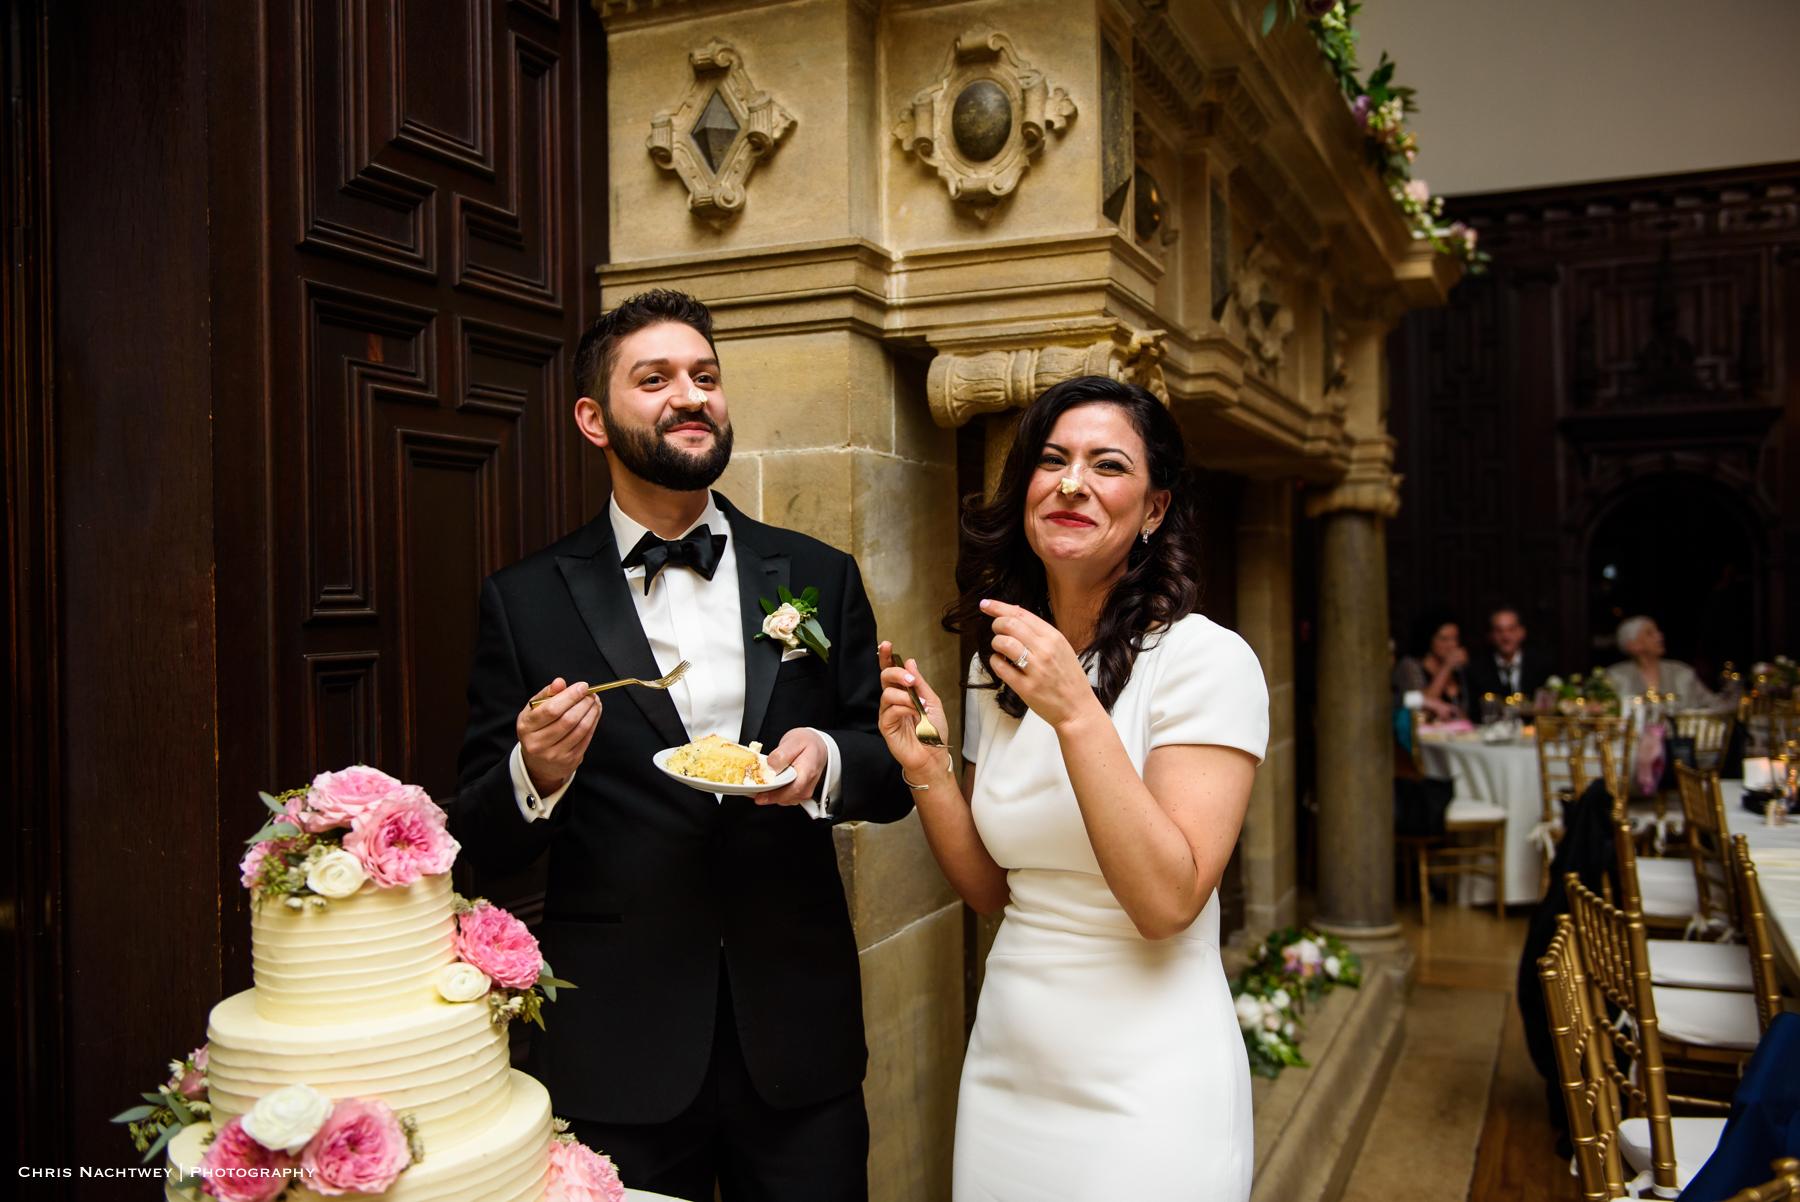 winter-branford-house-wedding-photos-groton-ct-chris-nachtwey-photography-2019-42.jpg